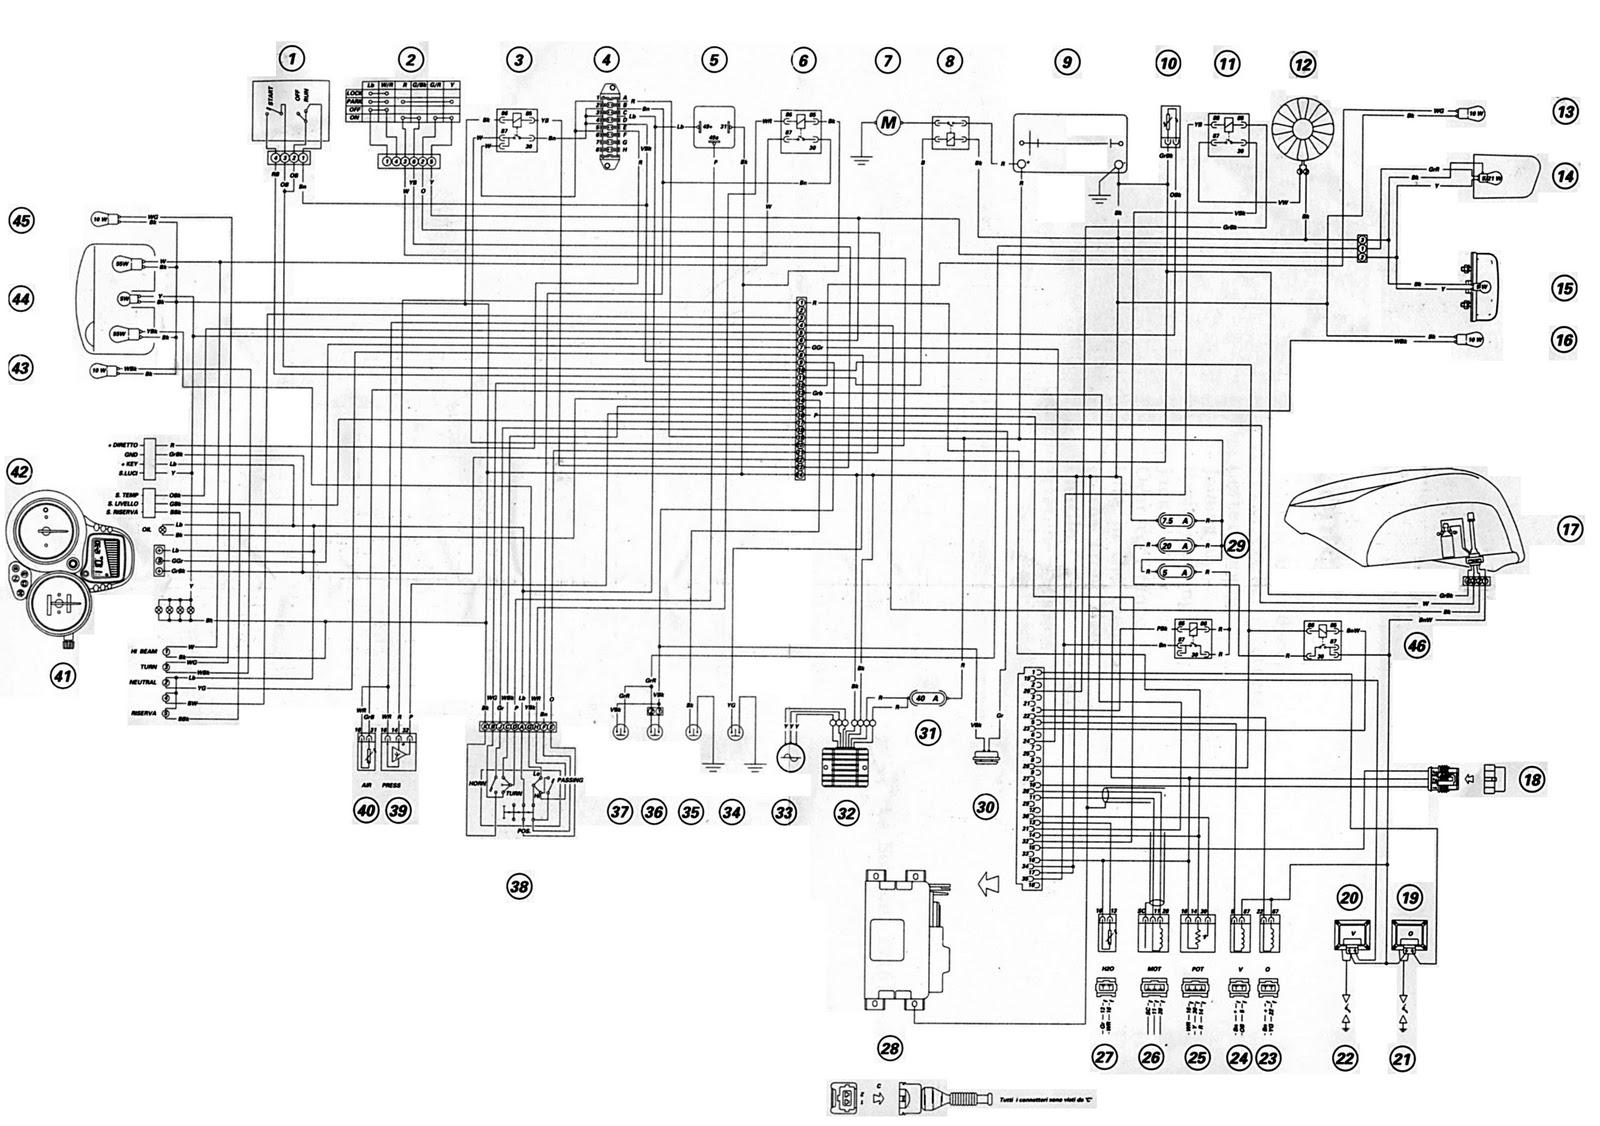 2003 ducati st4s wiring diagram